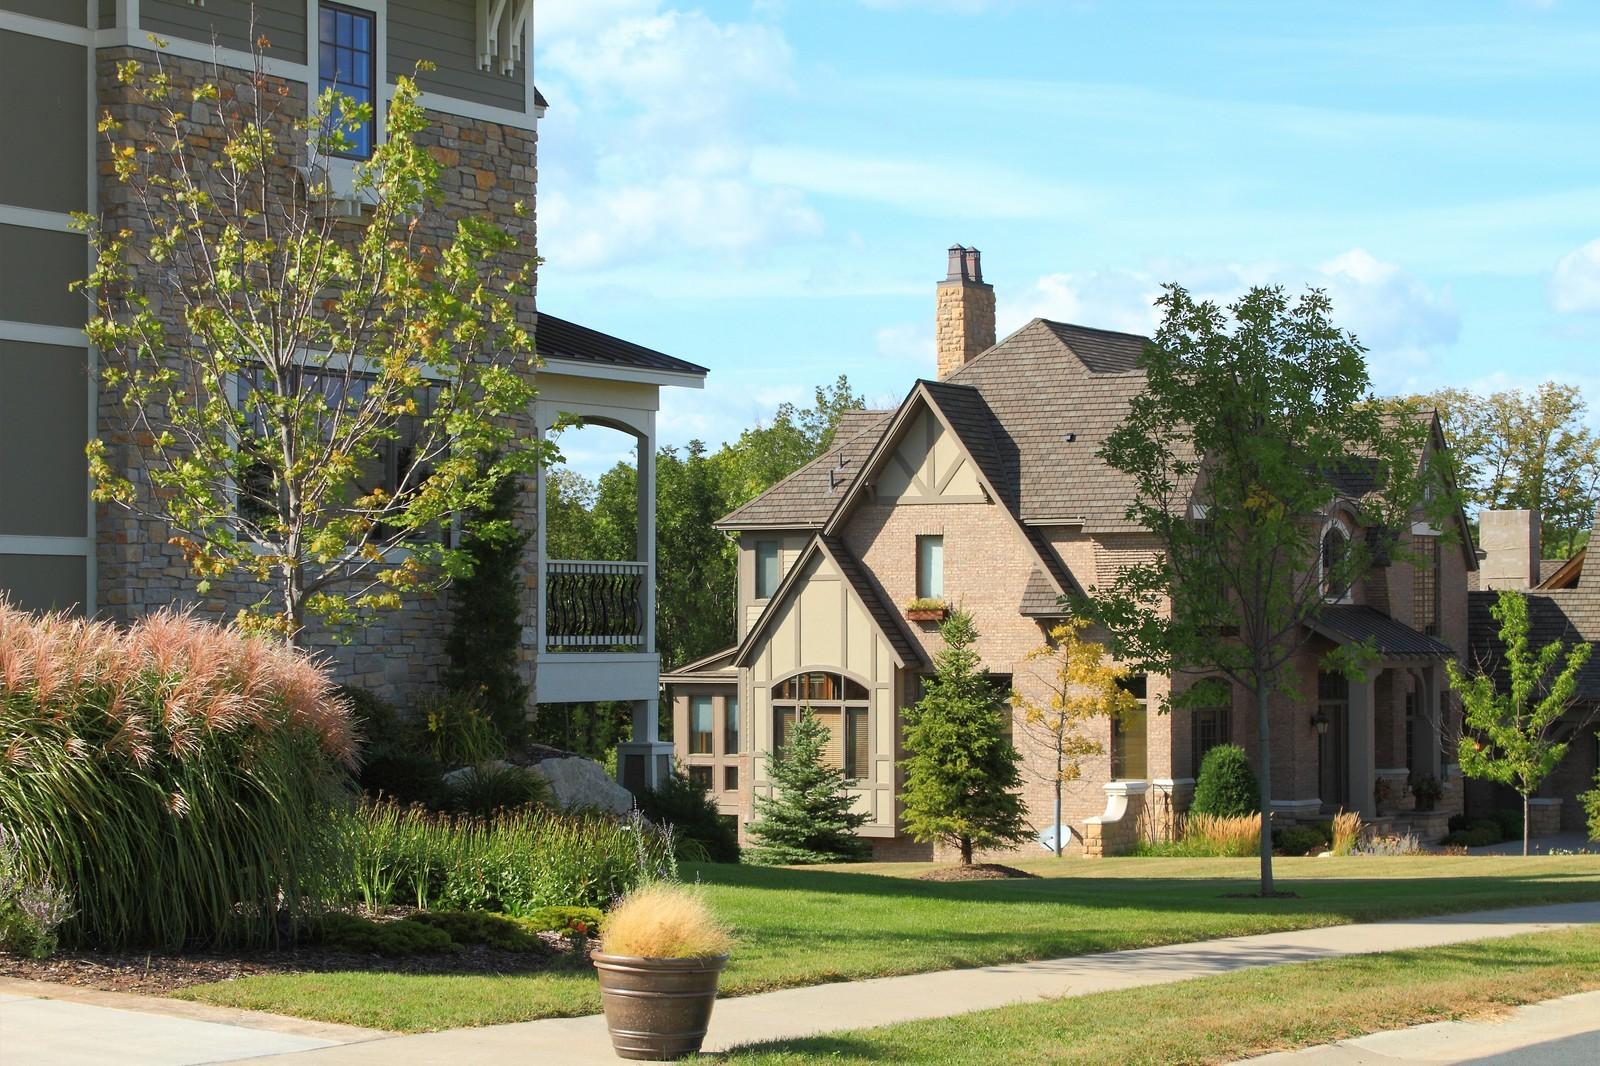 Real Estate Photography - 9627 Sky Lane, Eden Prairie, MN, 55347 - Location 3